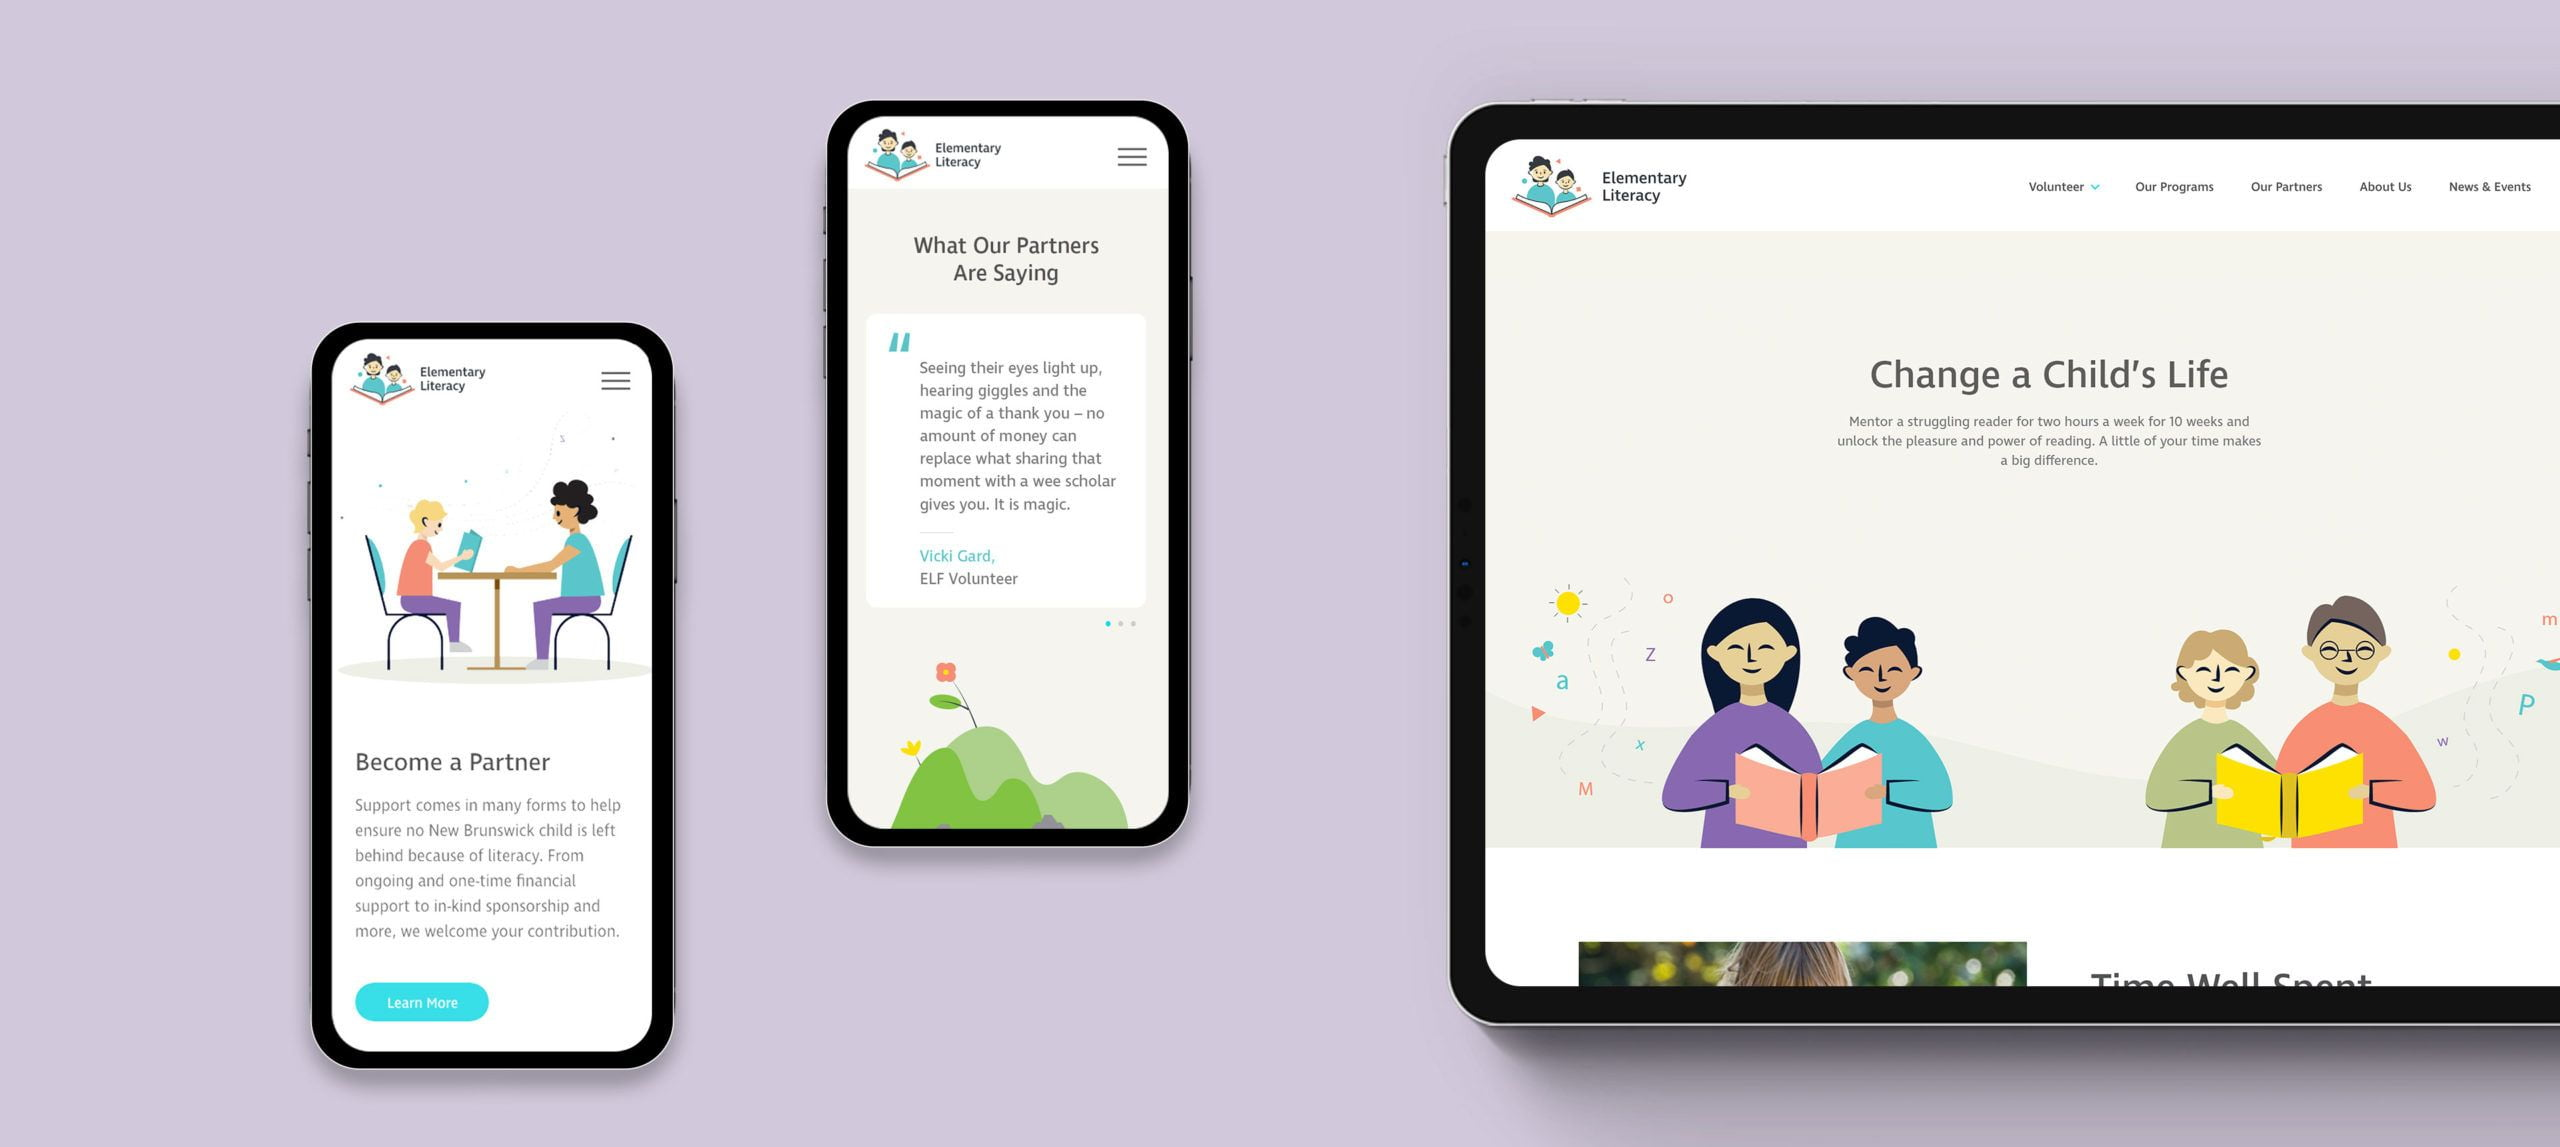 Elementary Literacy Website